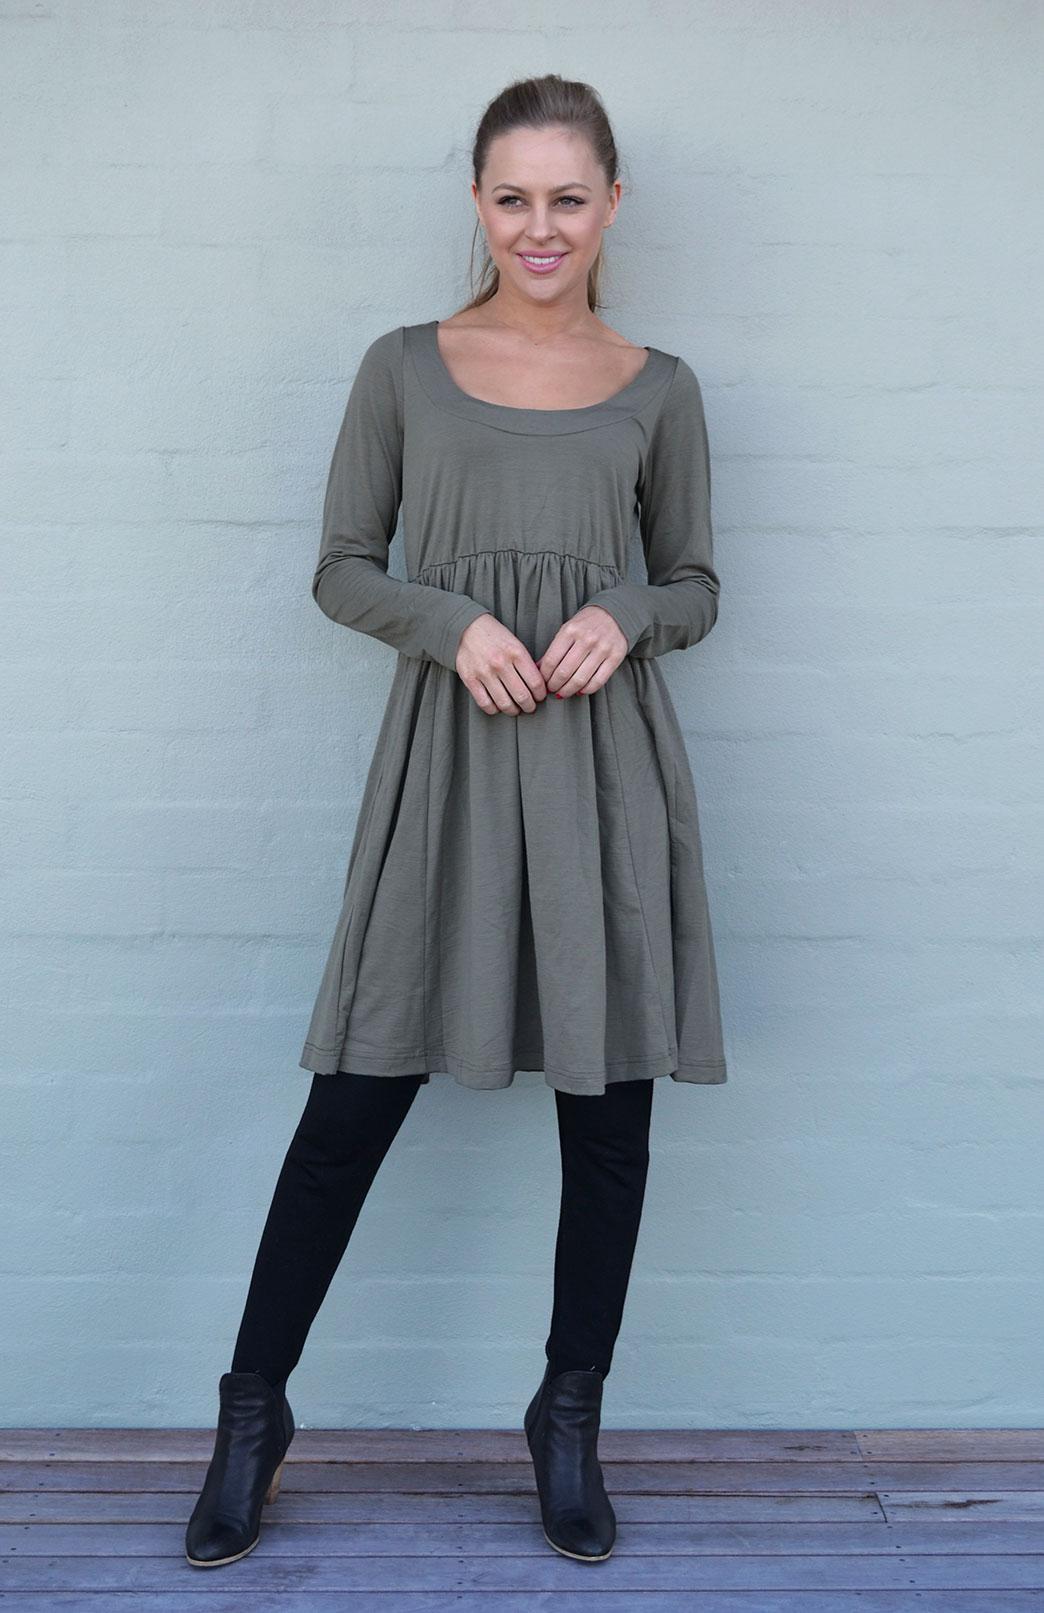 Gathered Dress - Long Sleeved - Women's Olive Green Long Sleeved Wool Dress with Gathered Waistline - Smitten Merino Tasmania Australia